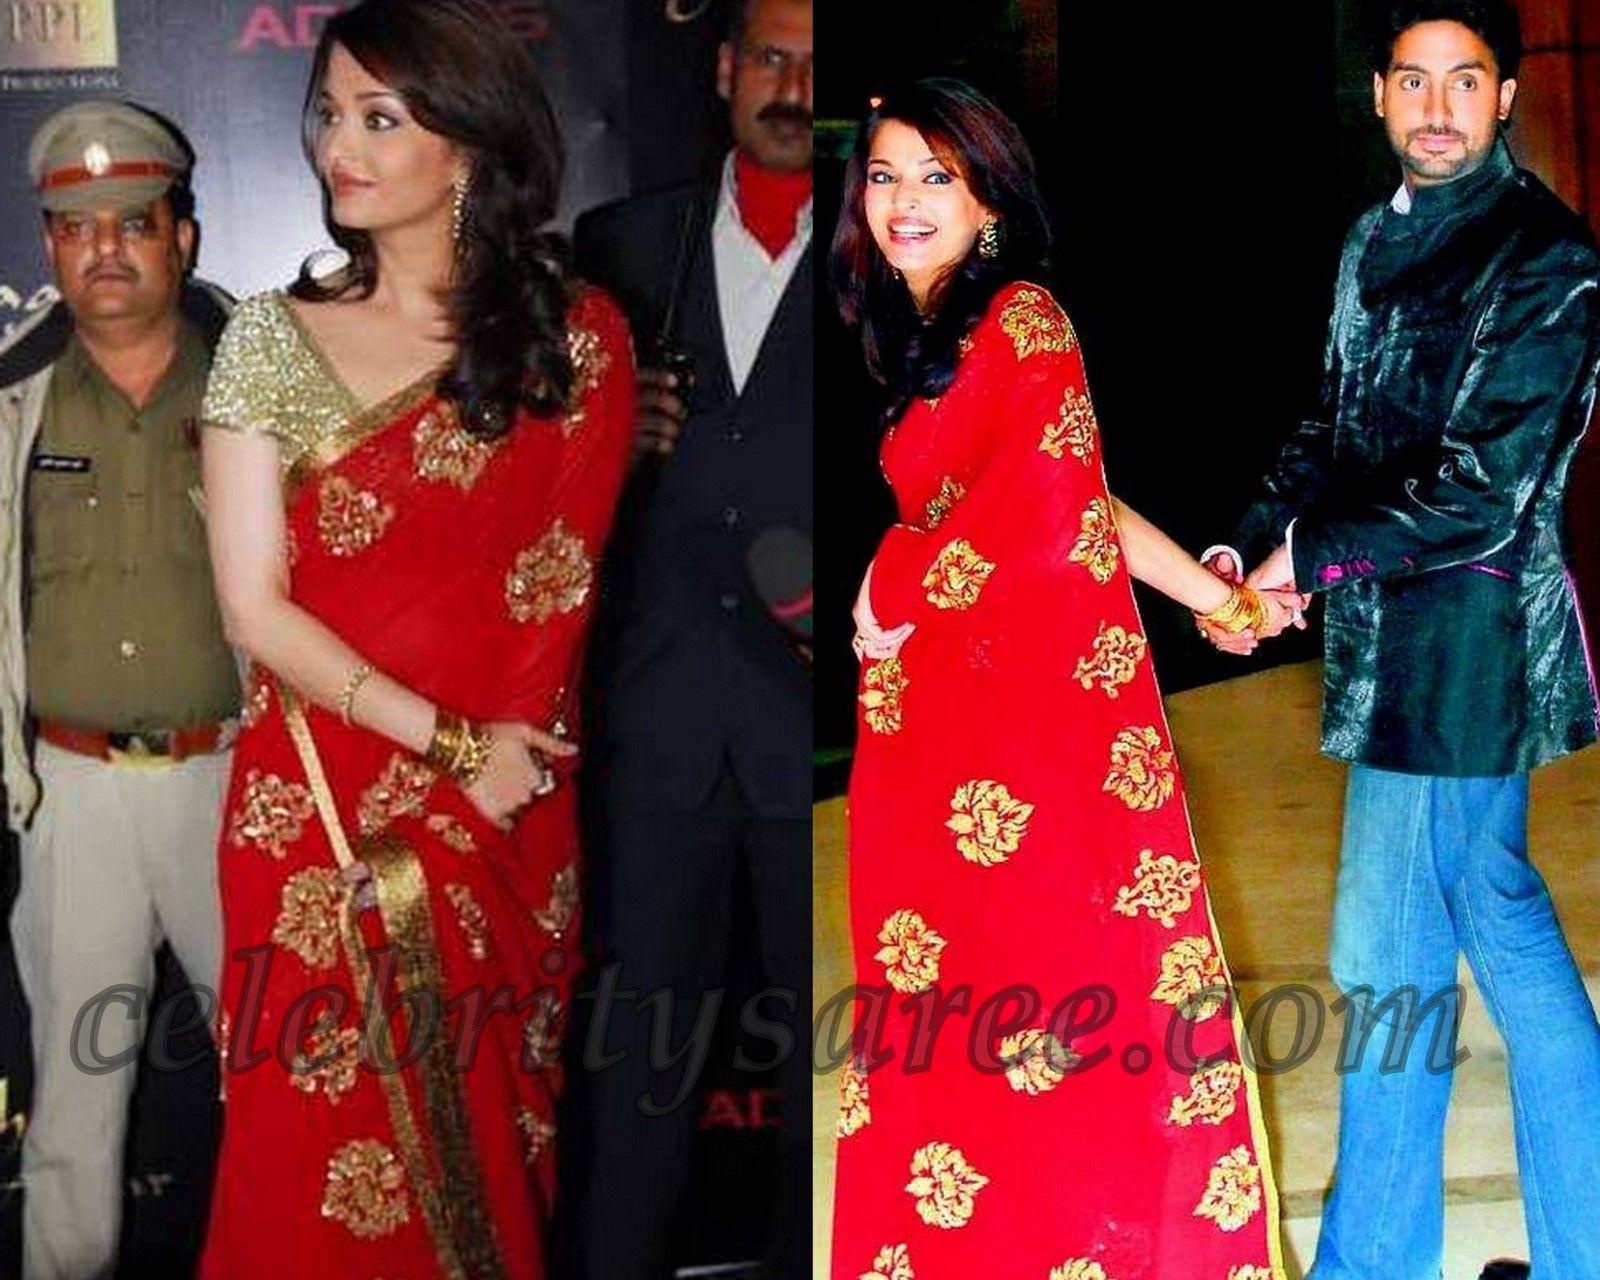 Aishwarya Rai In Red Saree With Designer Blouse